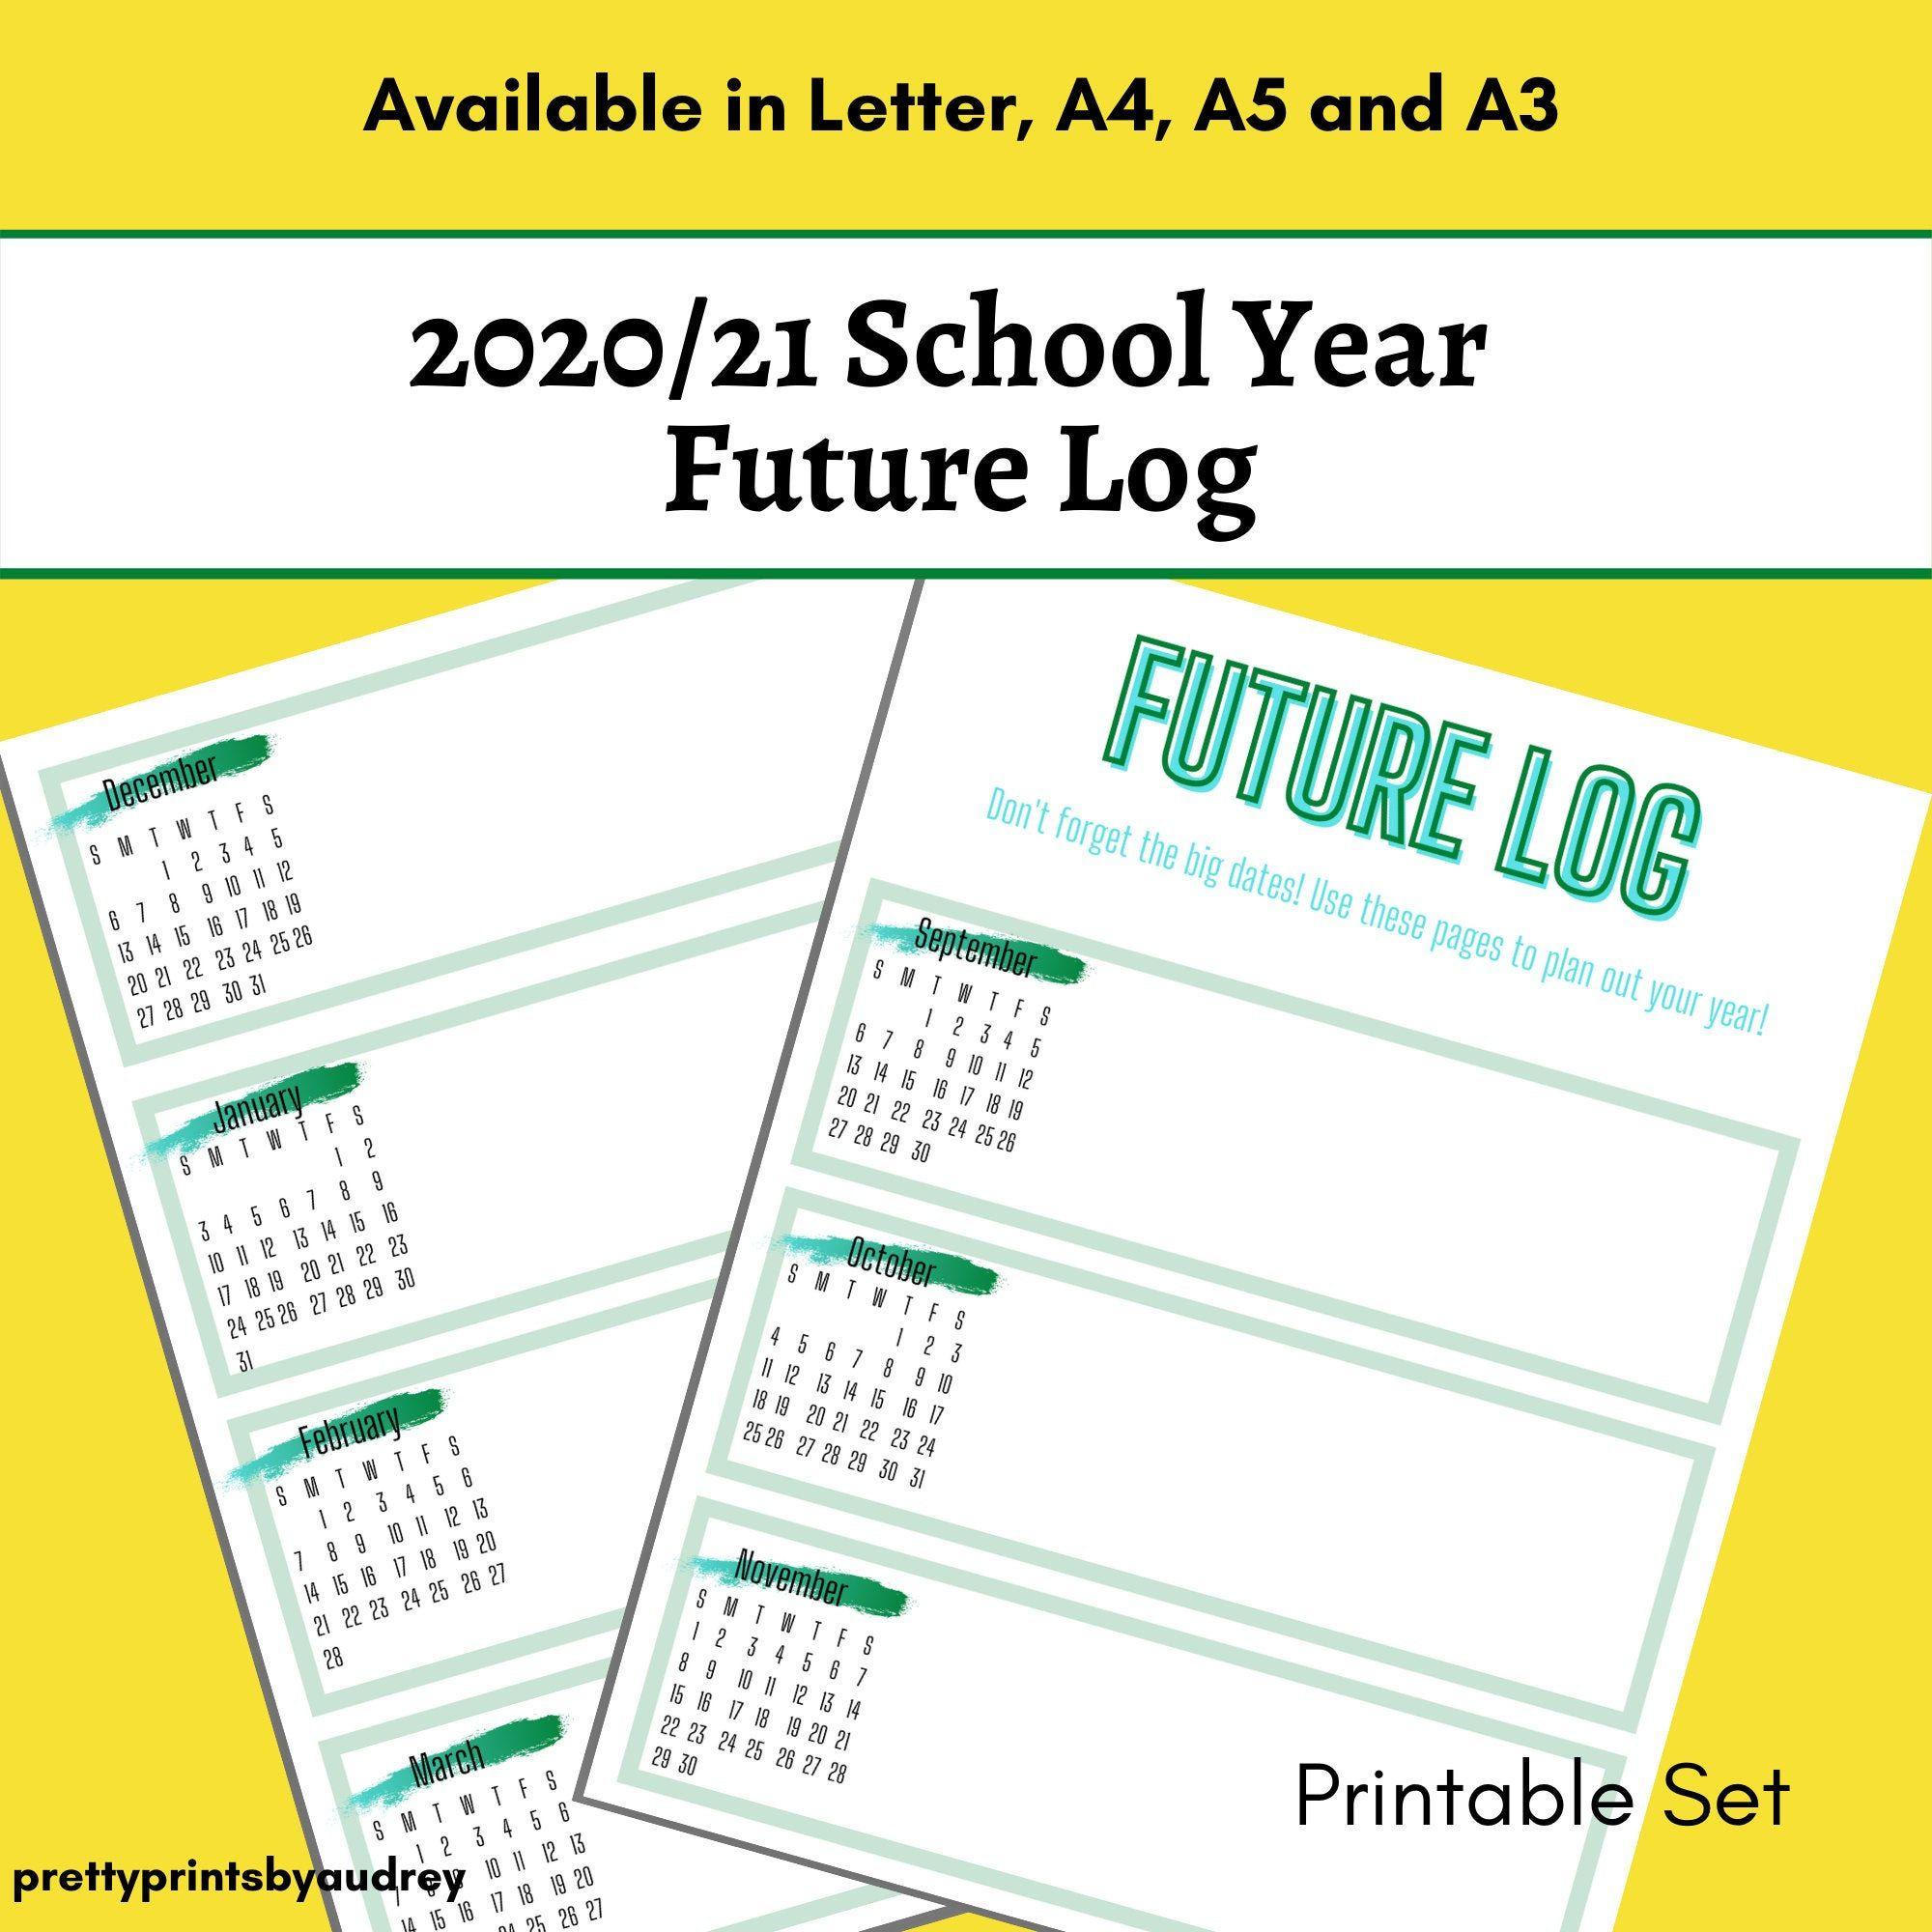 Printable Future Log 2020 21 Academic Year Future Log Bullet Journal Future Logger Printable Planner Amazon Handmade Printable Designs